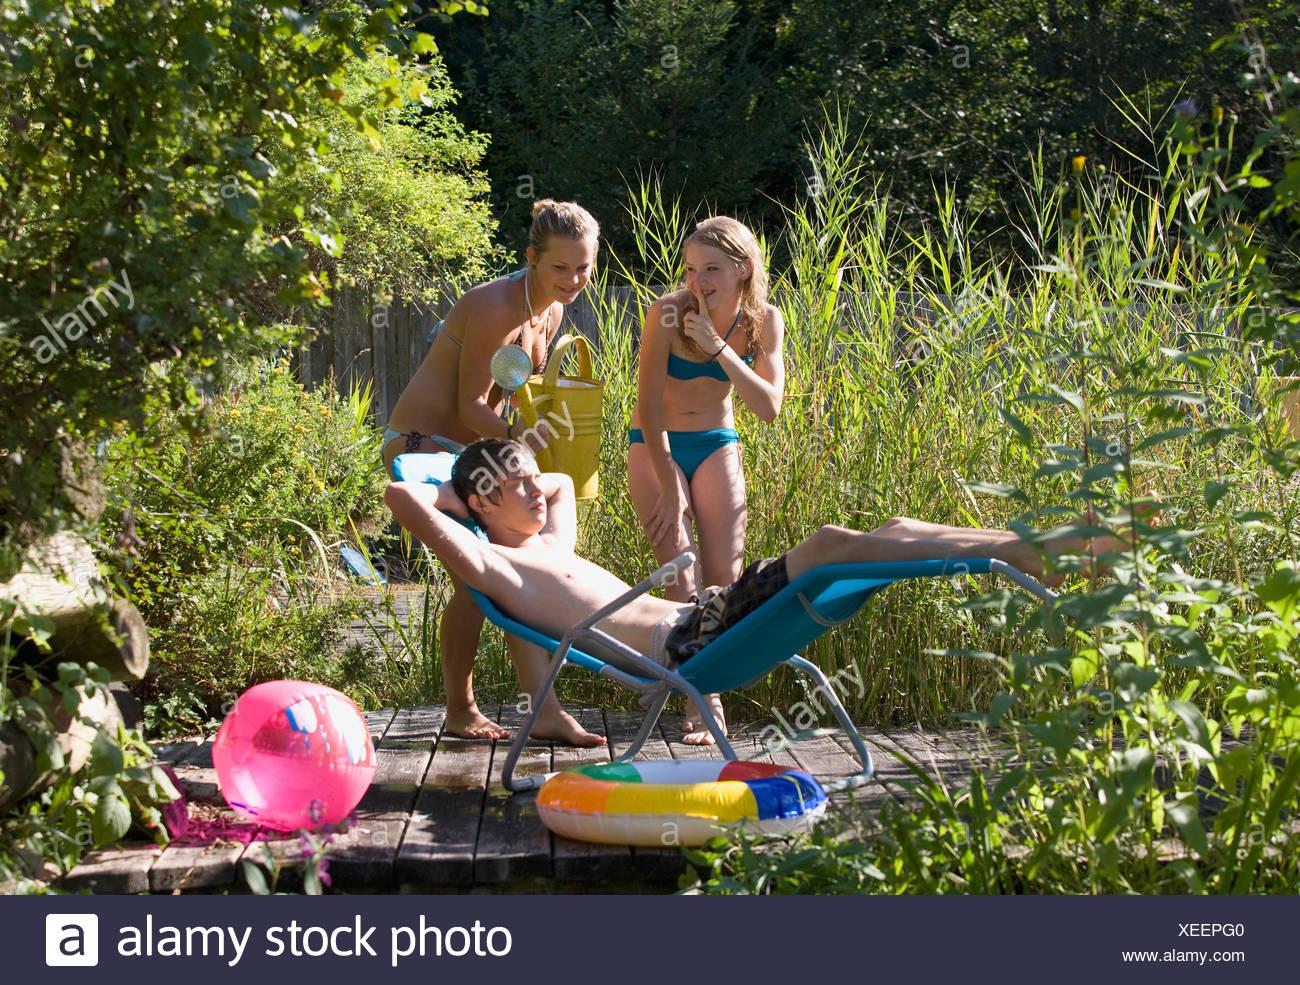 Austria, Salzburger Land, Teenagers (14-15) at garden pool - Stock Image